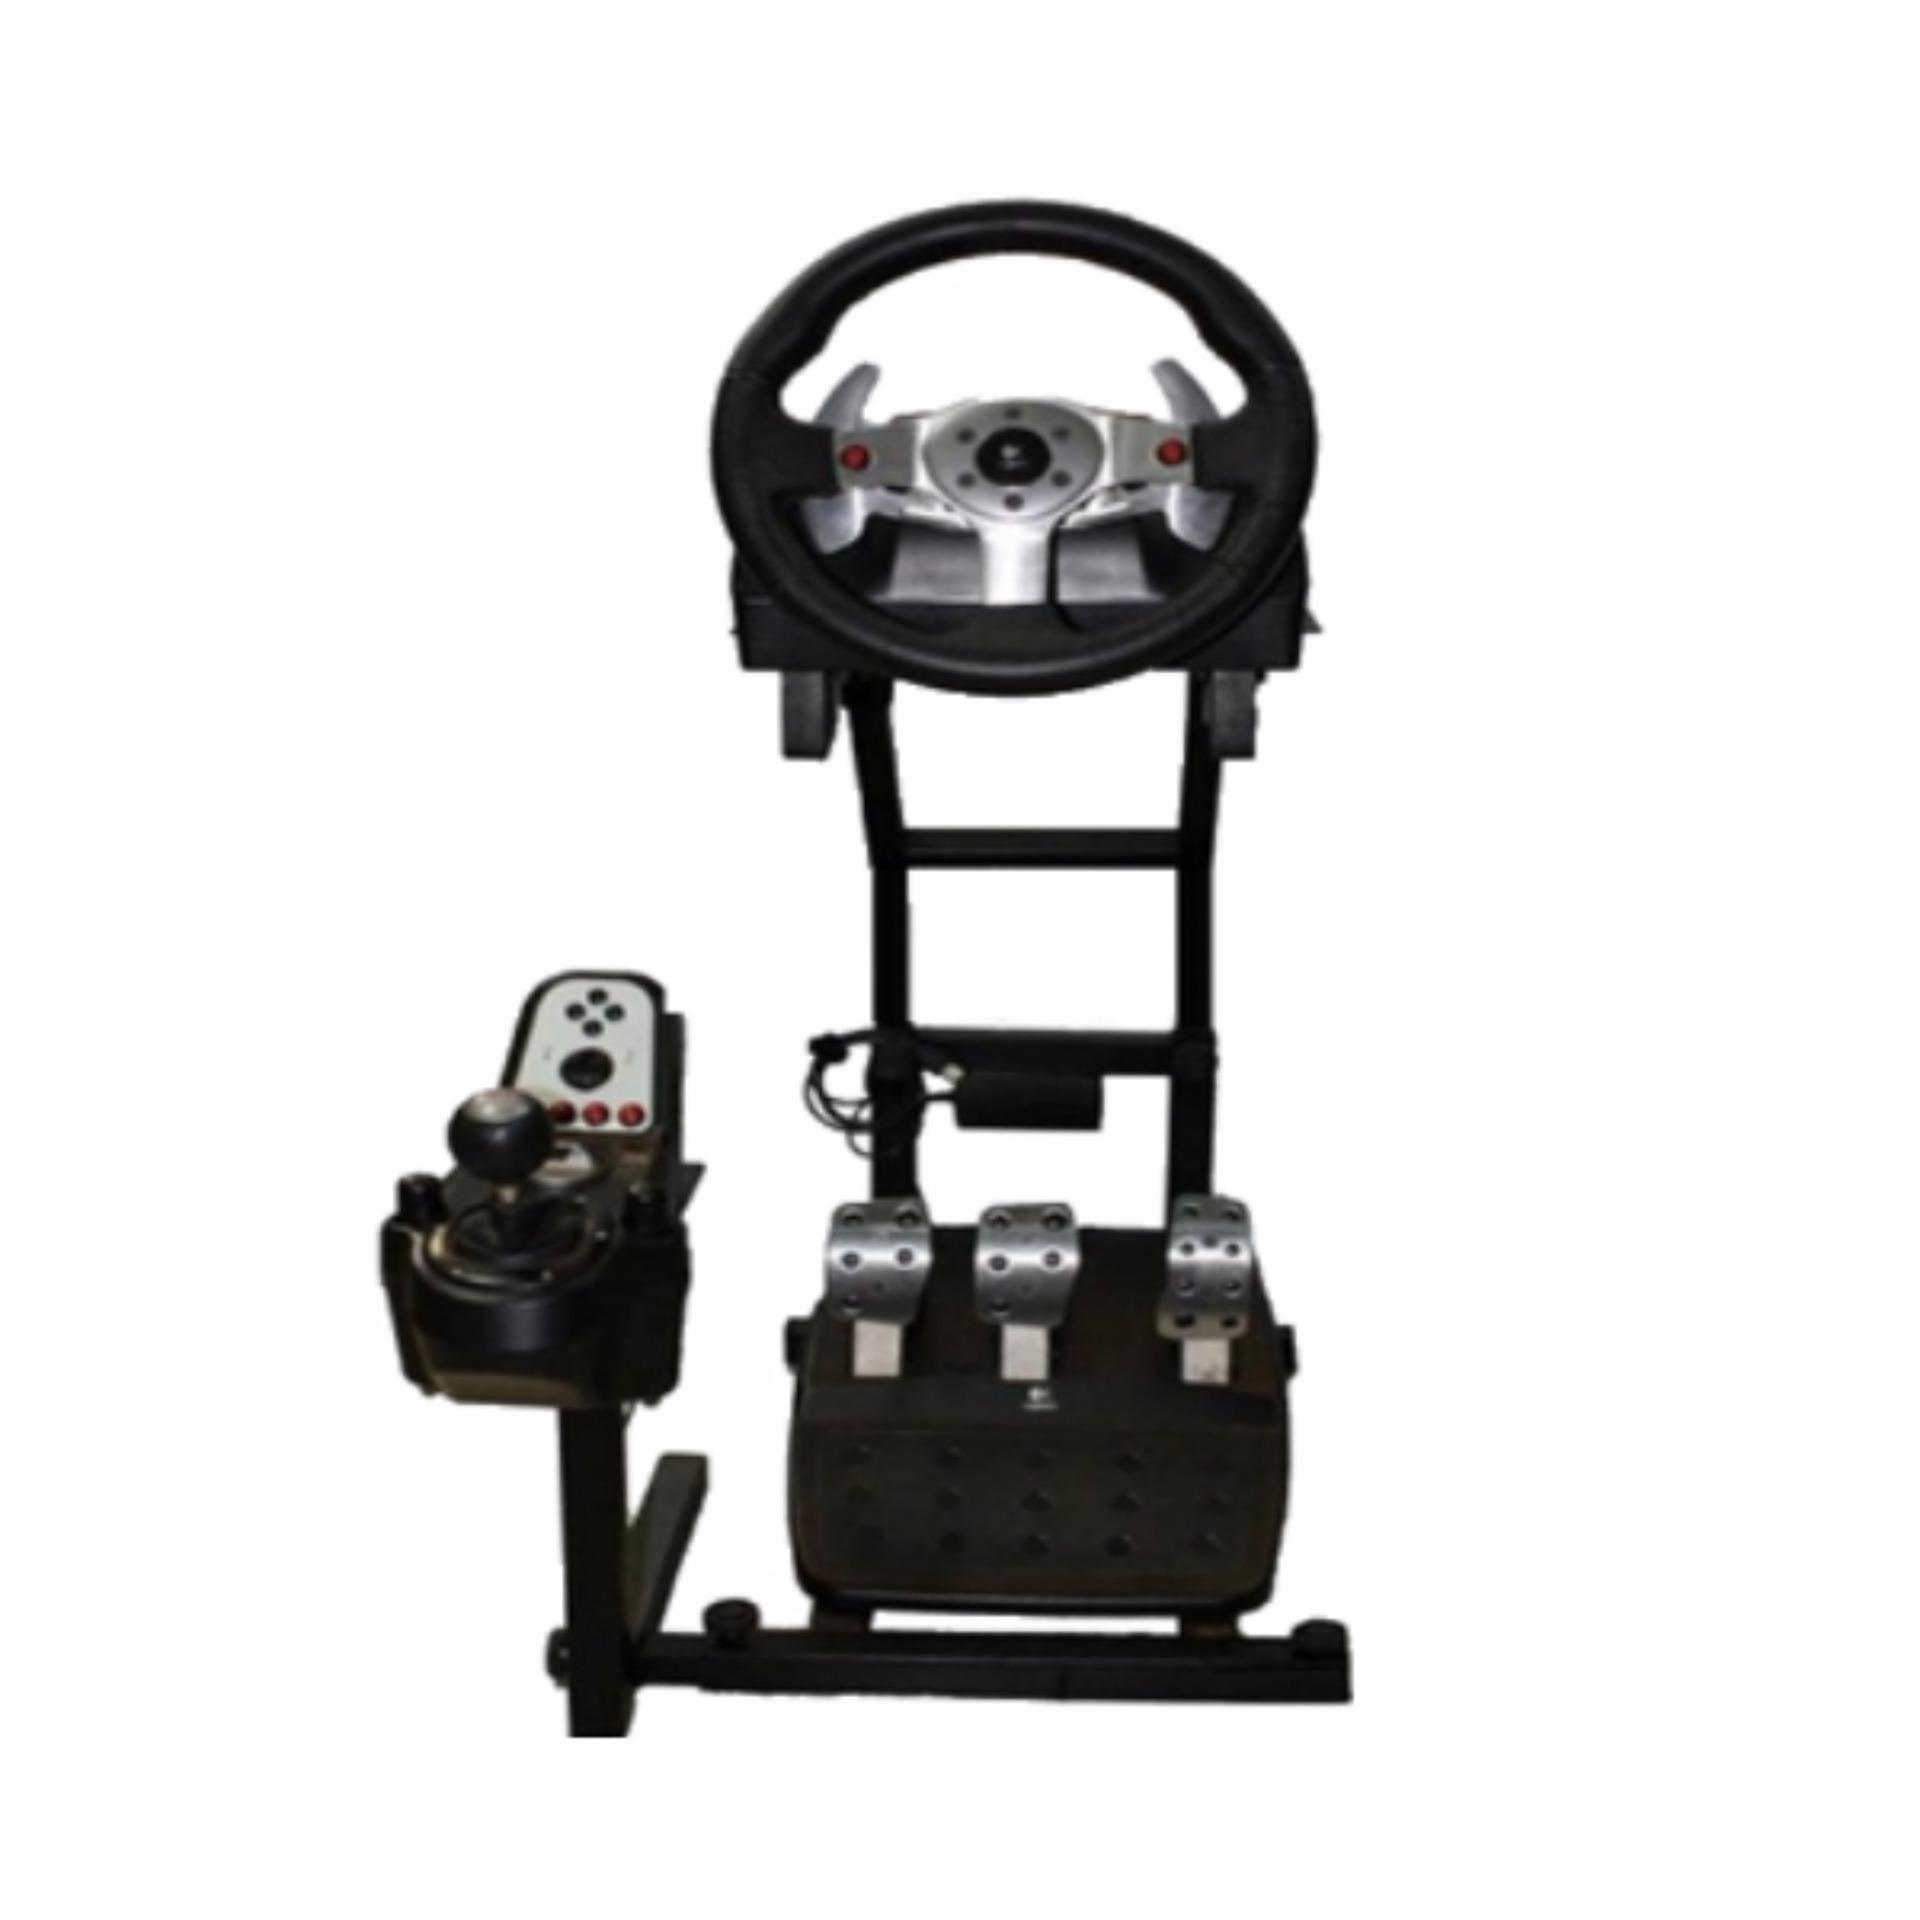 EG-01 Gaming Wheelstand